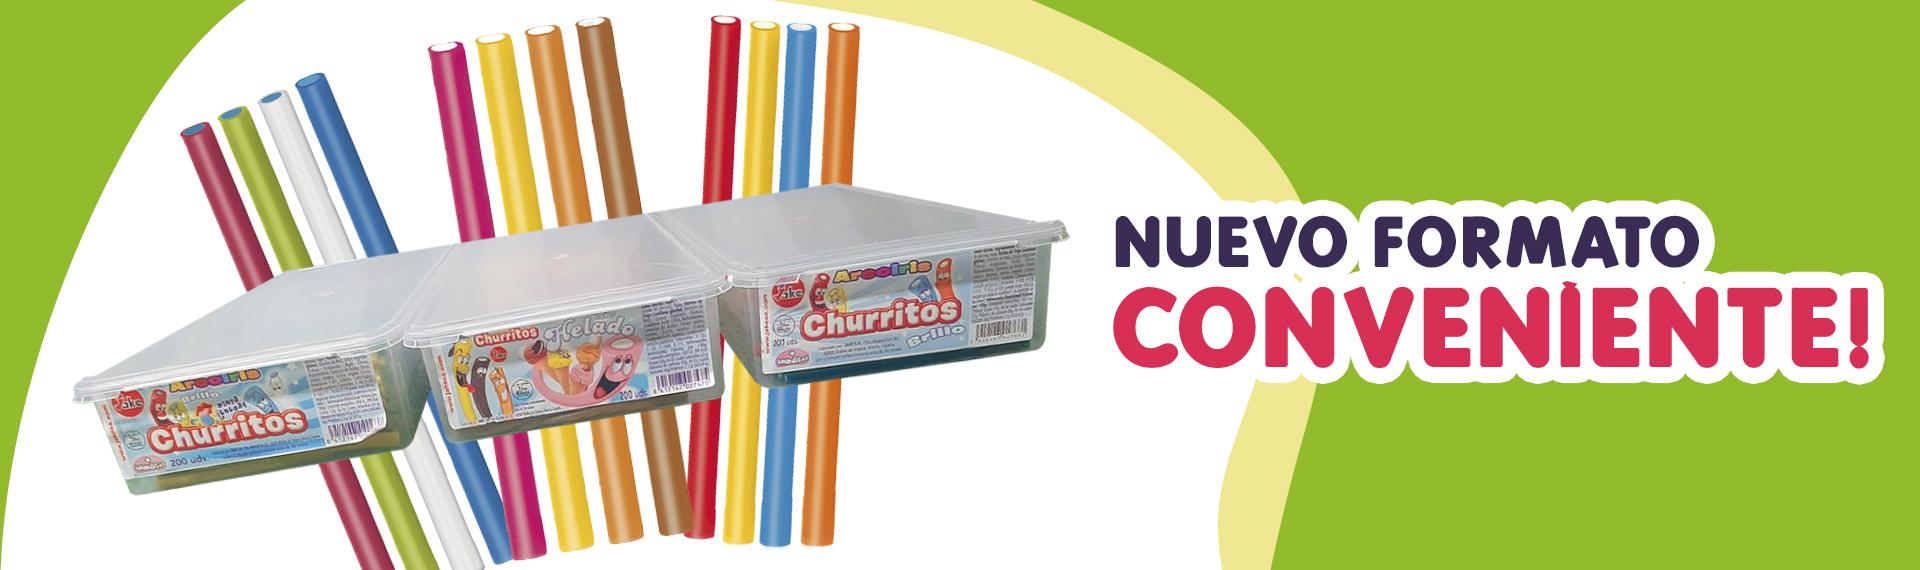 banner jake-churritos